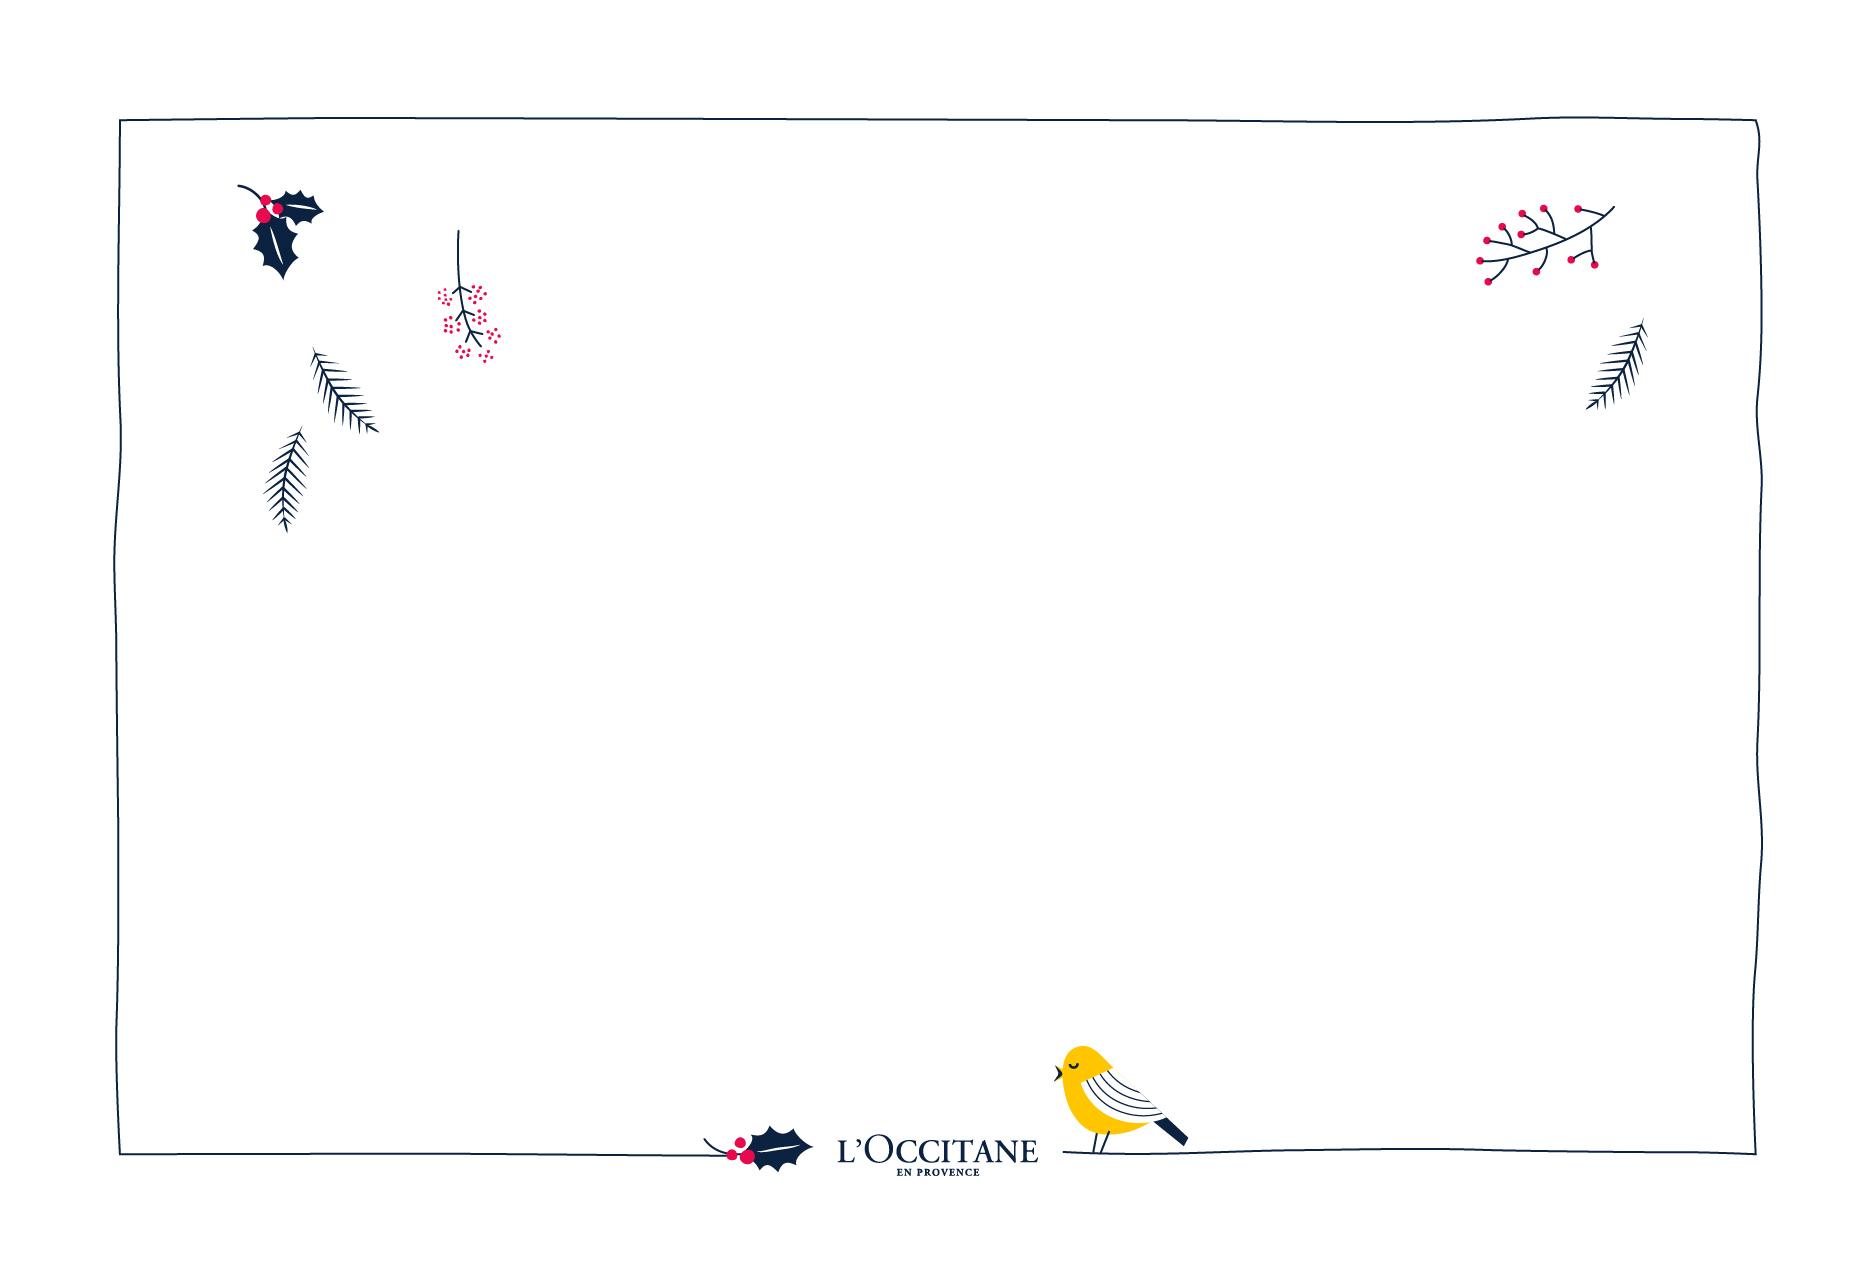 LOccitane+Candy+Cane+to+print+2_Artboard+29.jpg